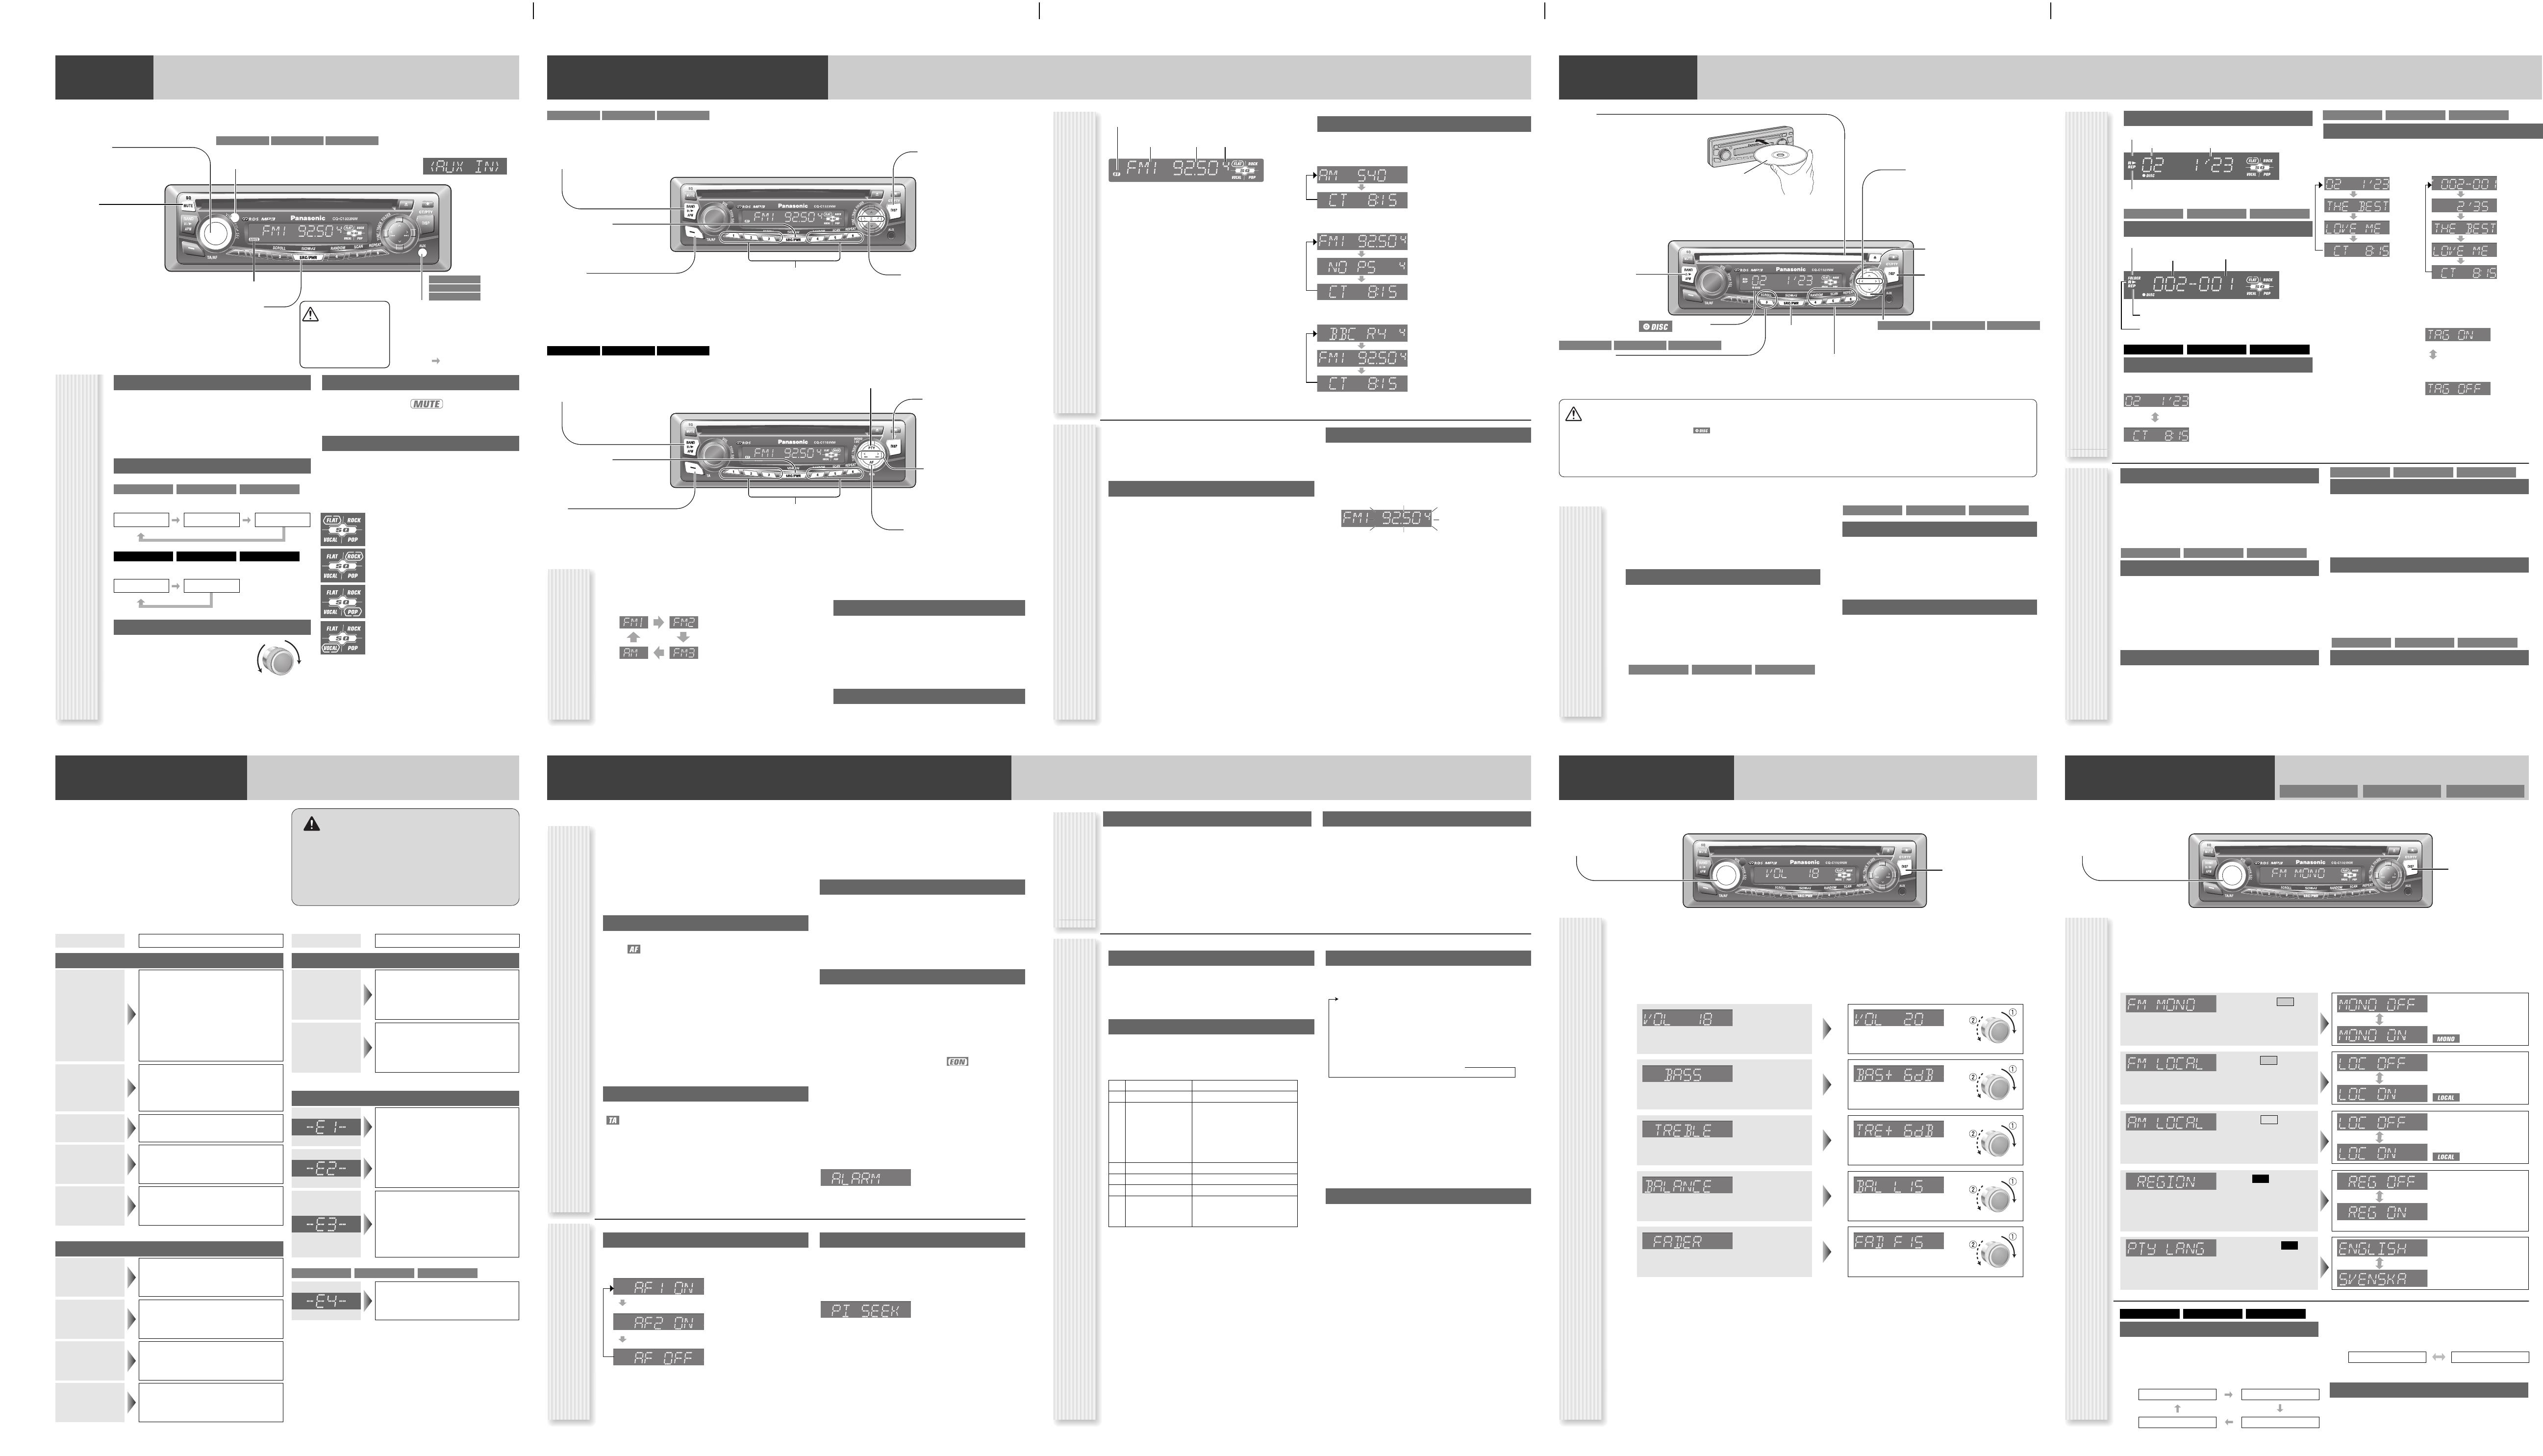 Handleiding Panasonic cq-c1303 (pagina 2 van 4) (English) on panasonic manuals, panasonic car stereo wiring, panasonic schematic diagram, panasonic parts, panasonic connectors diagram, panasonic help,